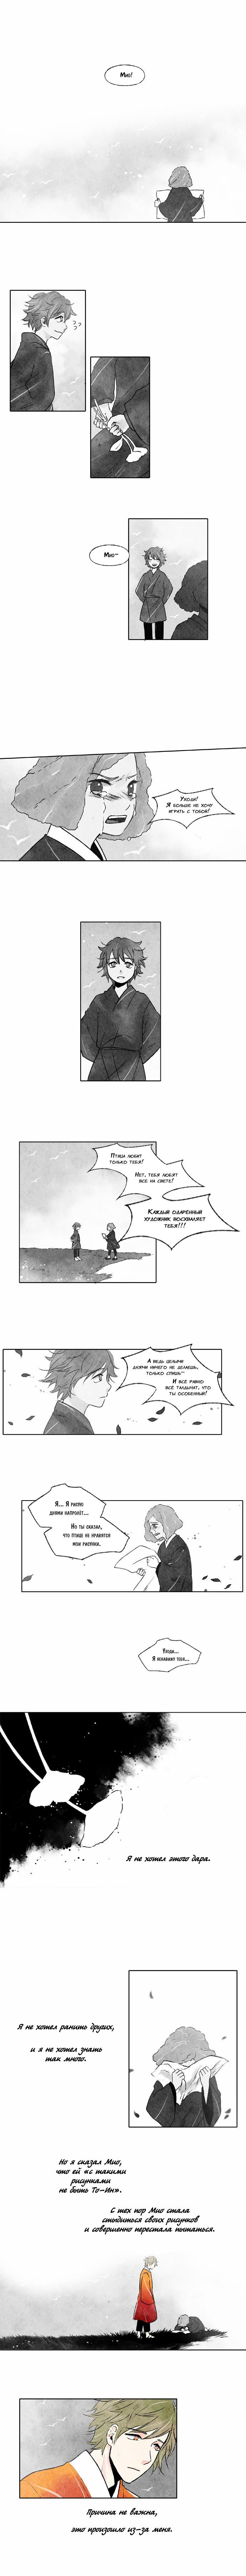 https://r1.ninemanga.com/comics/pic2/39/22503/416373/1532884260775.jpg Page 1